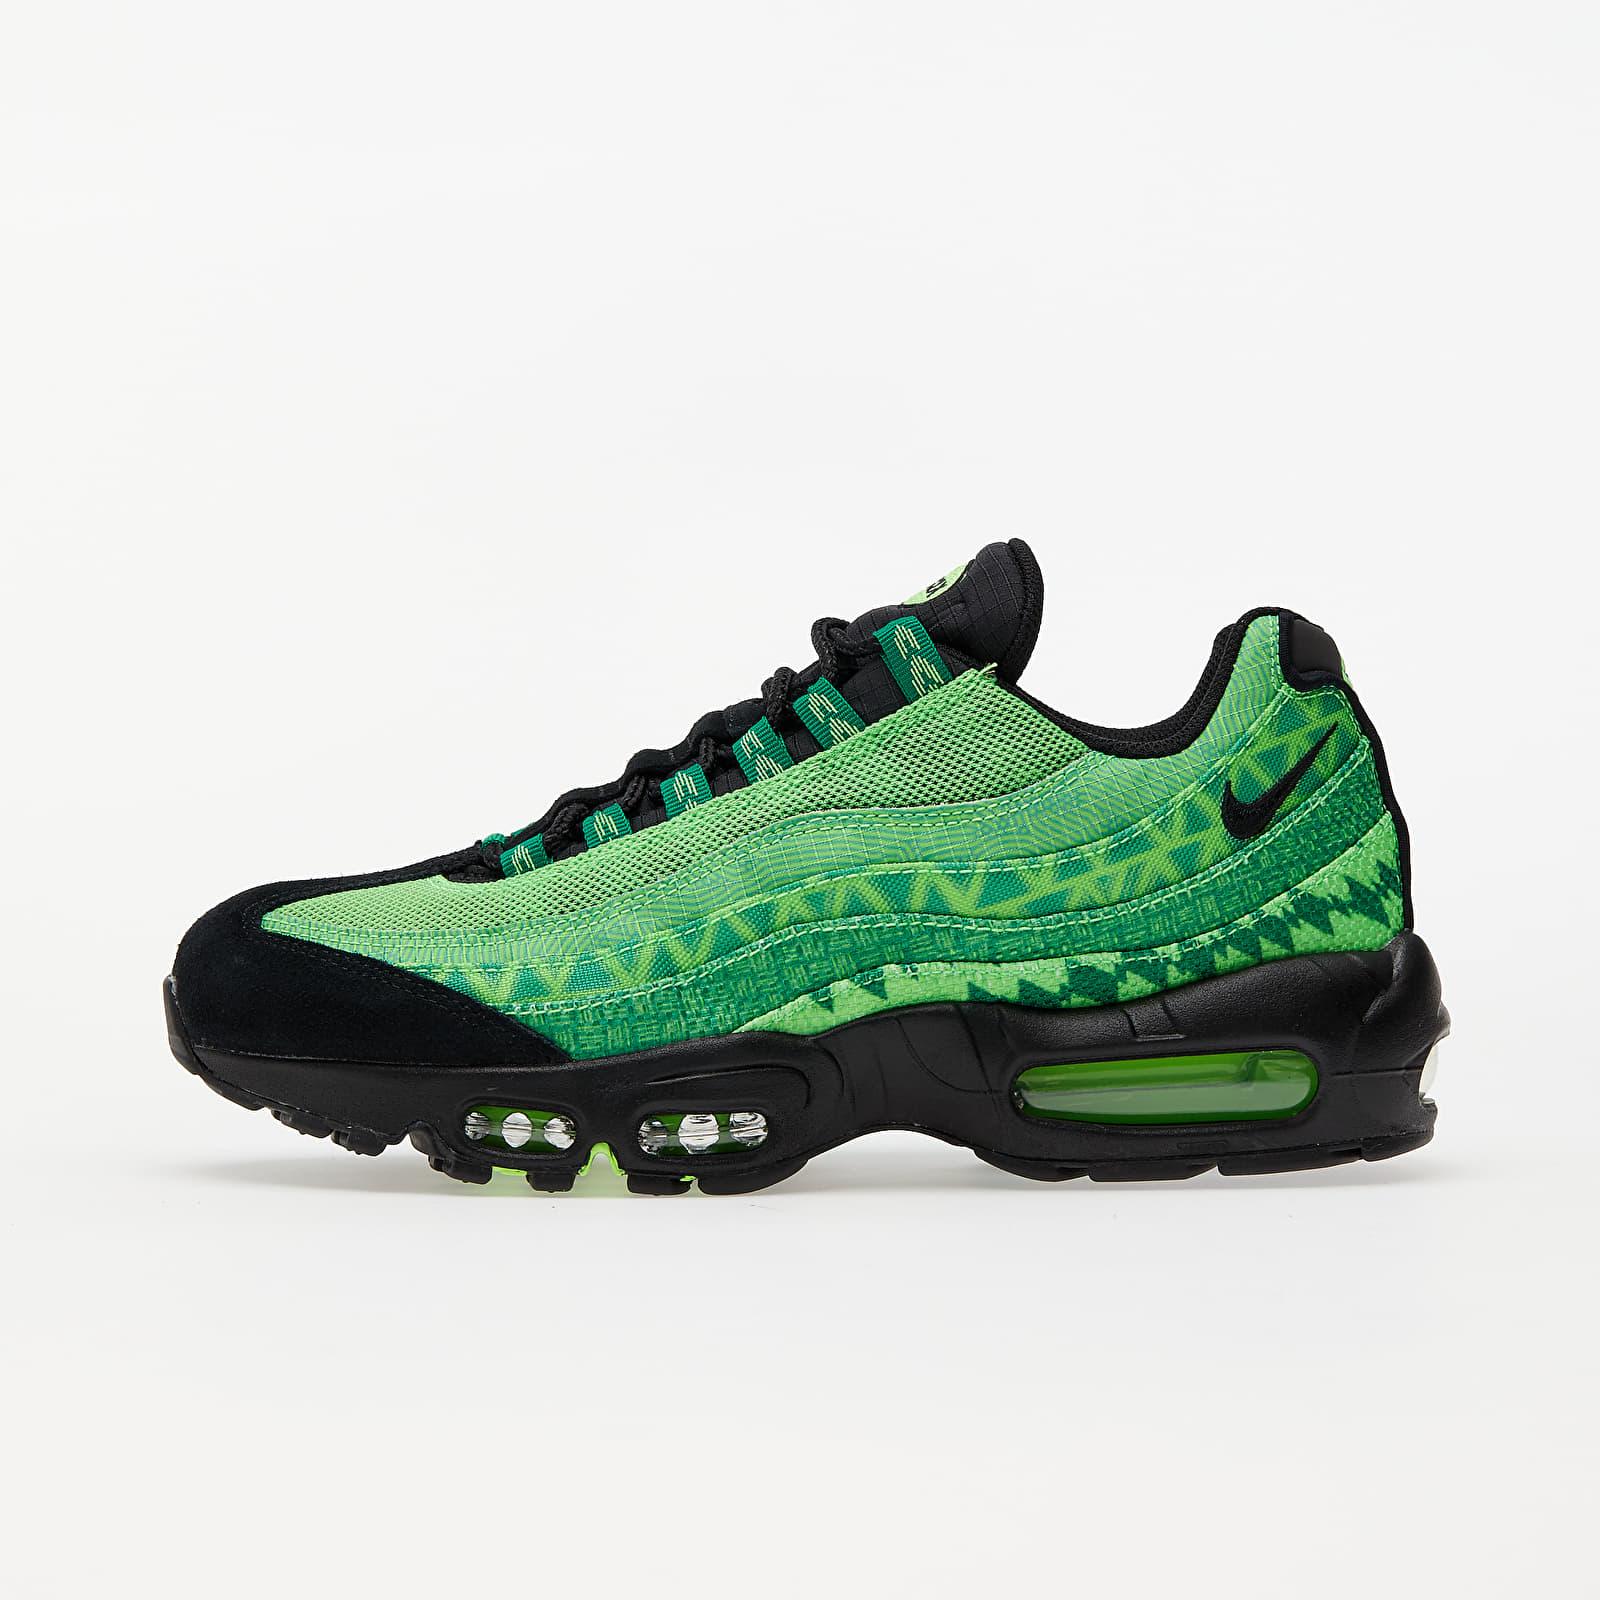 Nike Air Max 95 Ctry Pine Green/ Black-Sub Lime-White CW2360-300